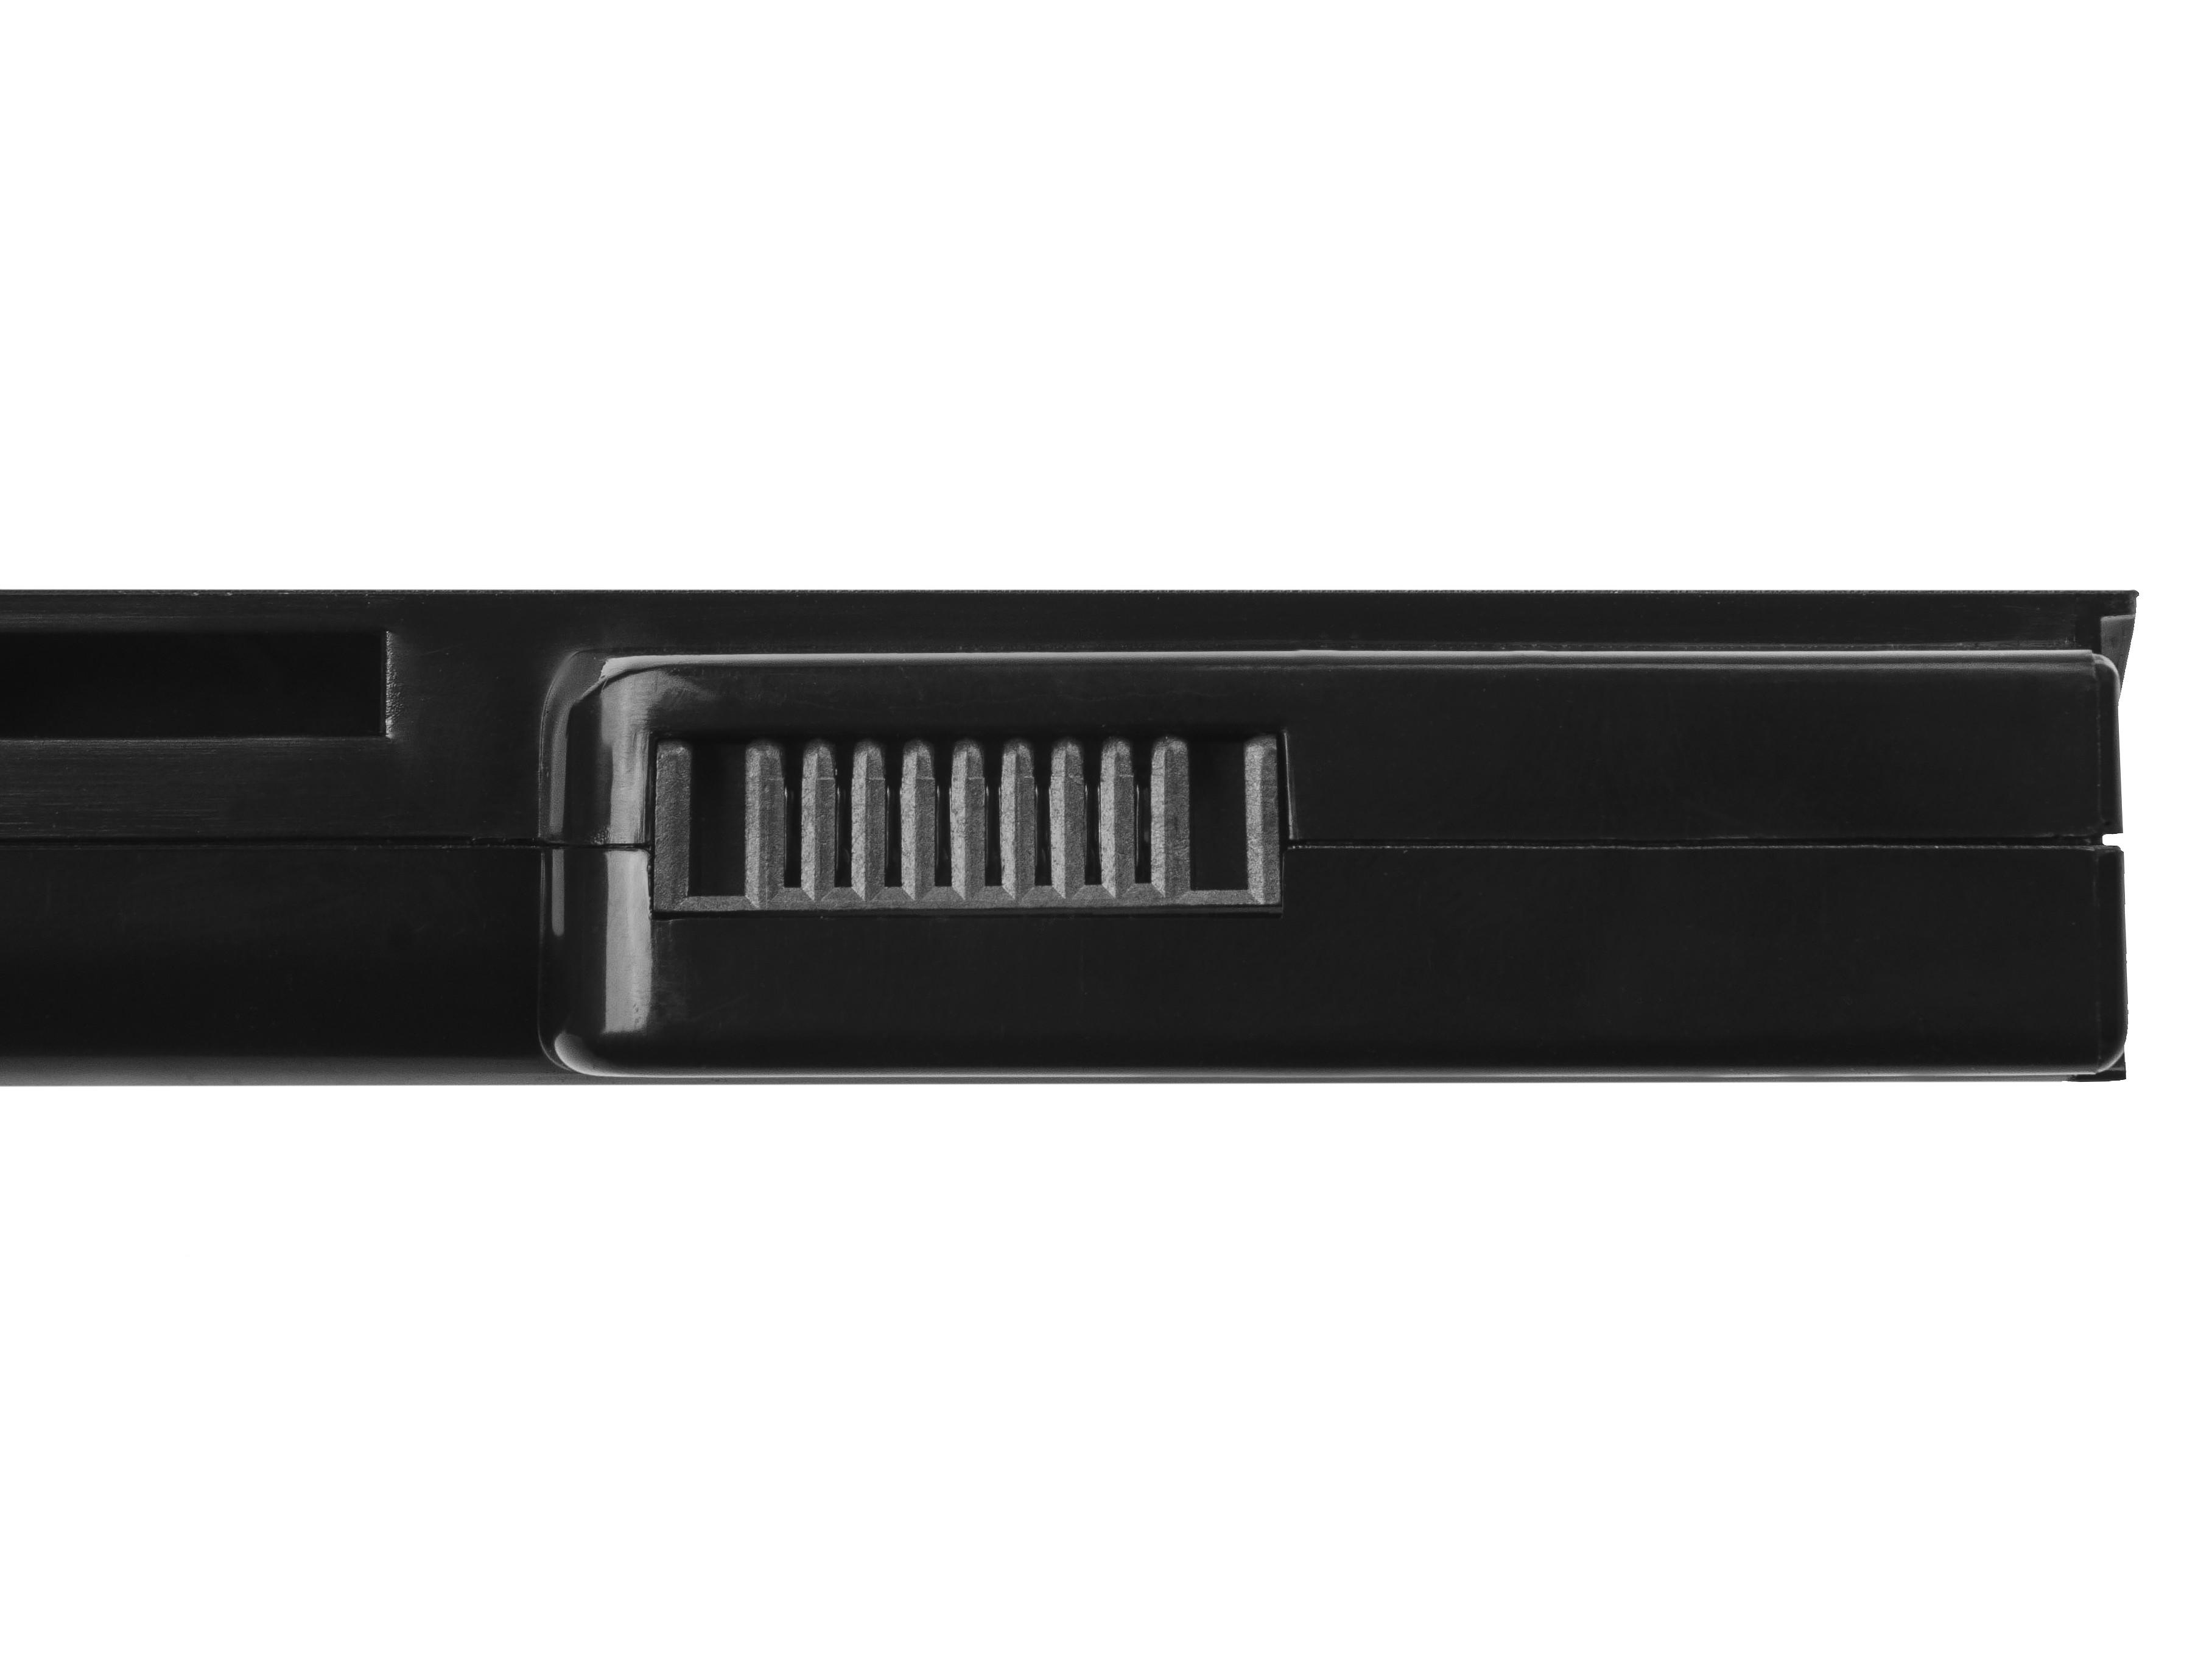 Bärbar dator Batteri ULTRA CC06XL för HP EliteBook 8460p 8460w 8470p 8560p 8570p ProBook 6460b 6560b 6570b